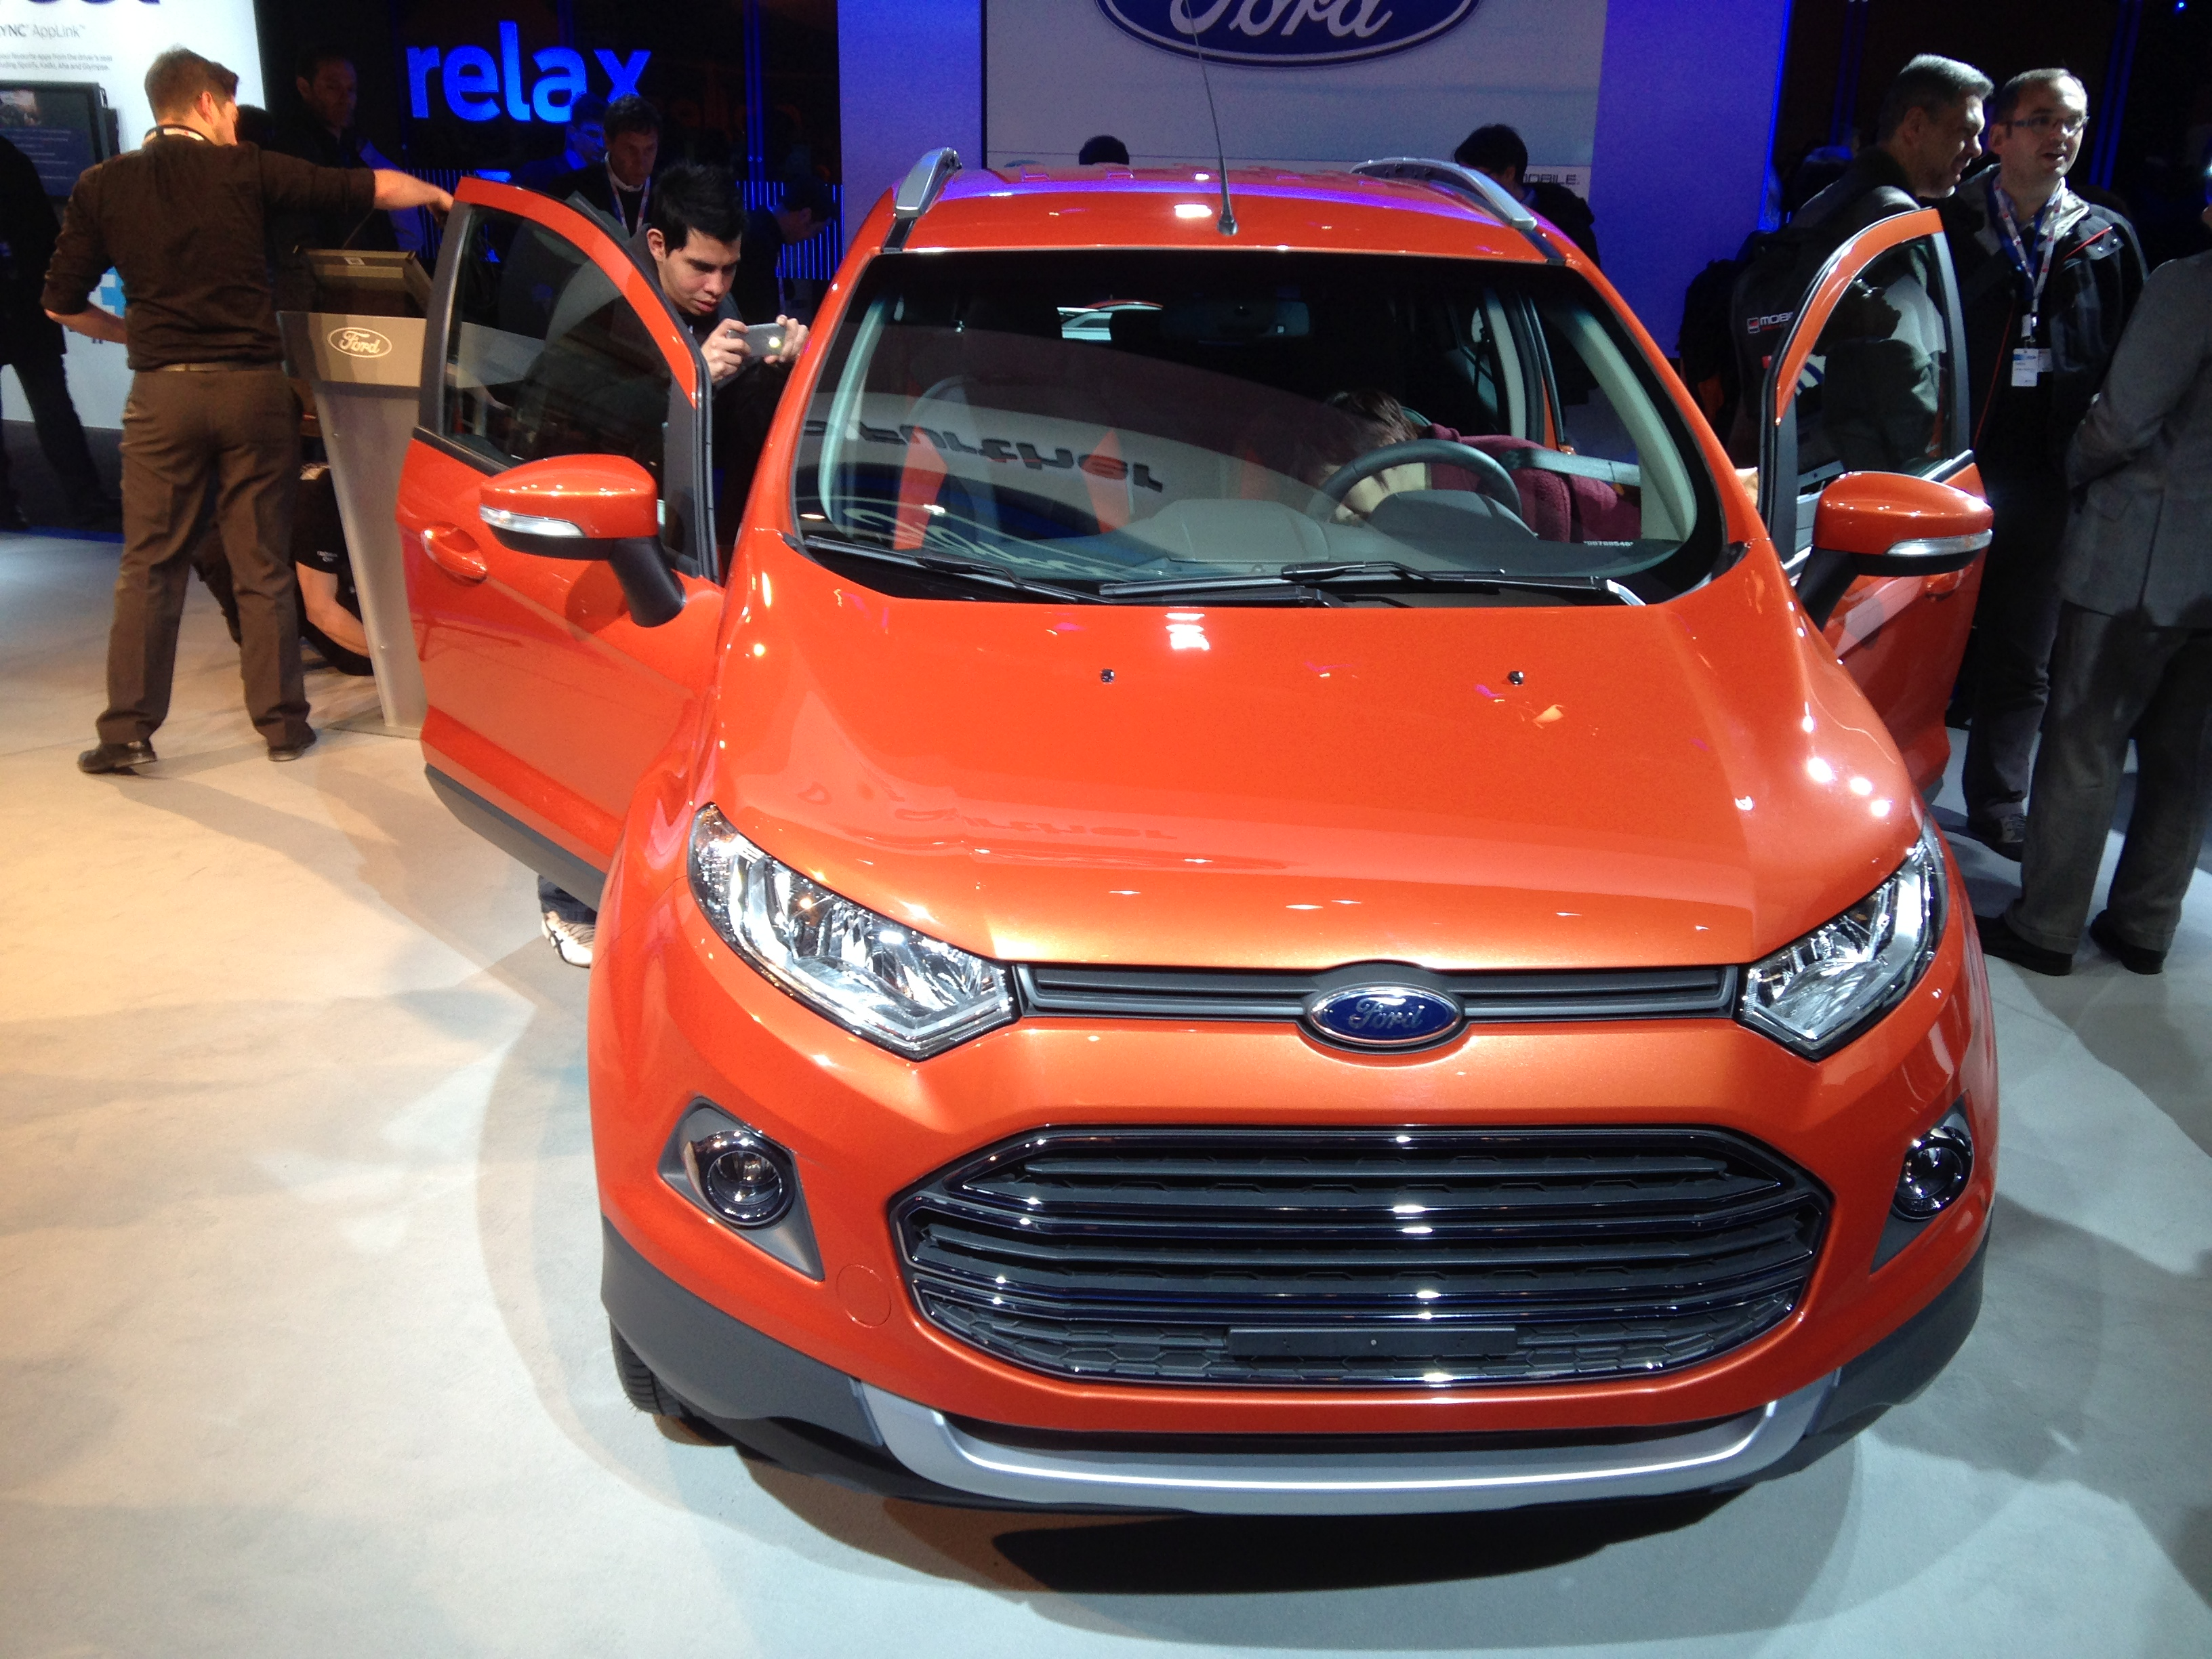 Ford EcoSport MWC